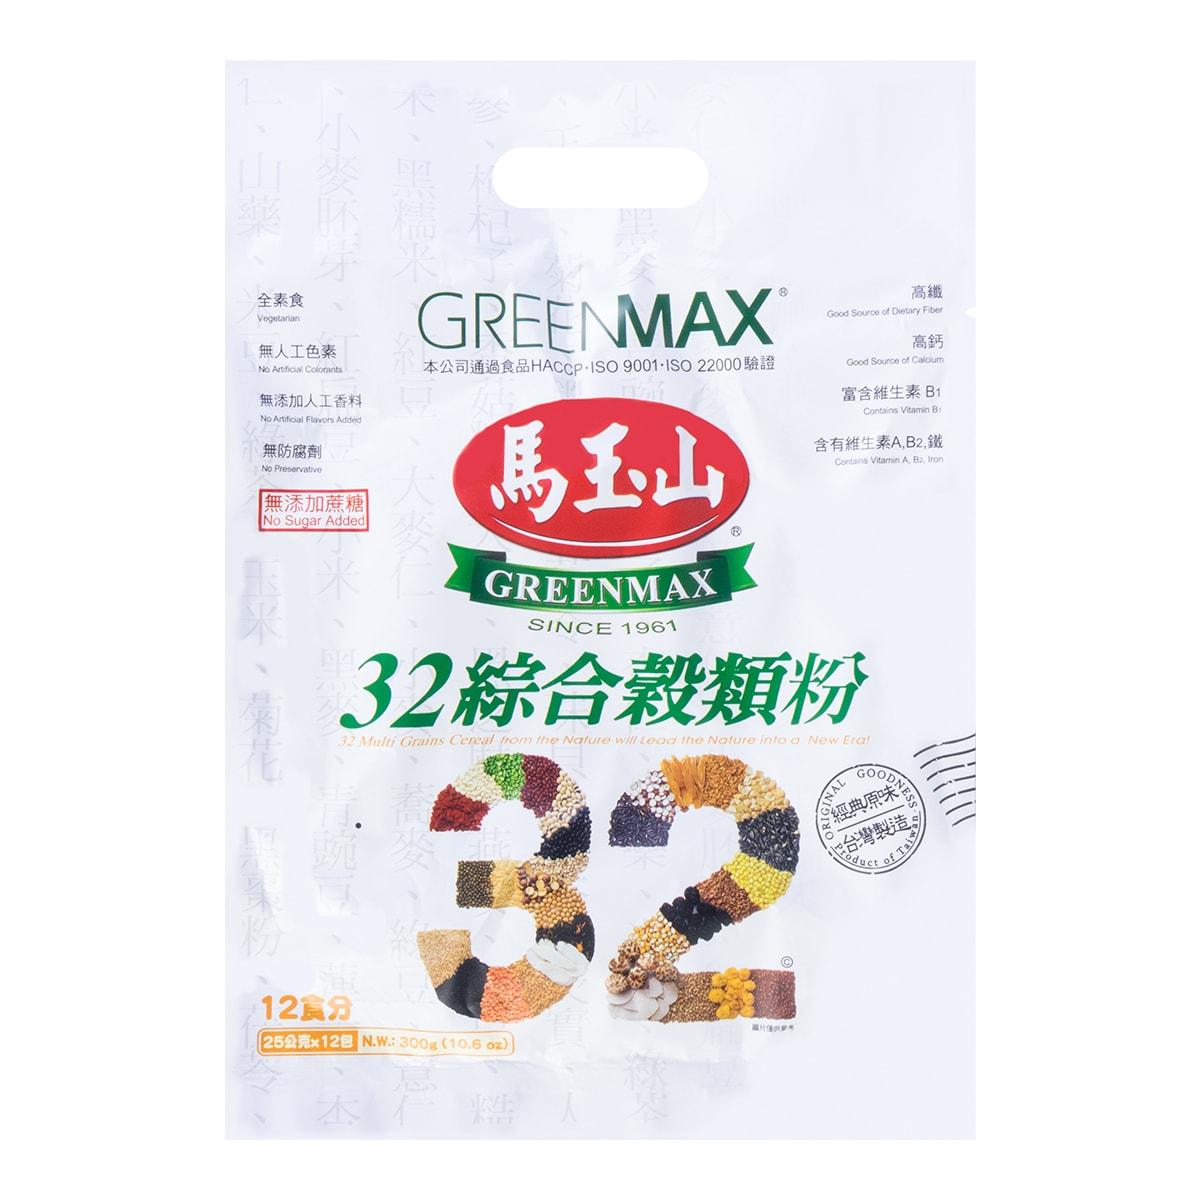 GREENMAX 32 Multi Grains Cereal 12packs 300g